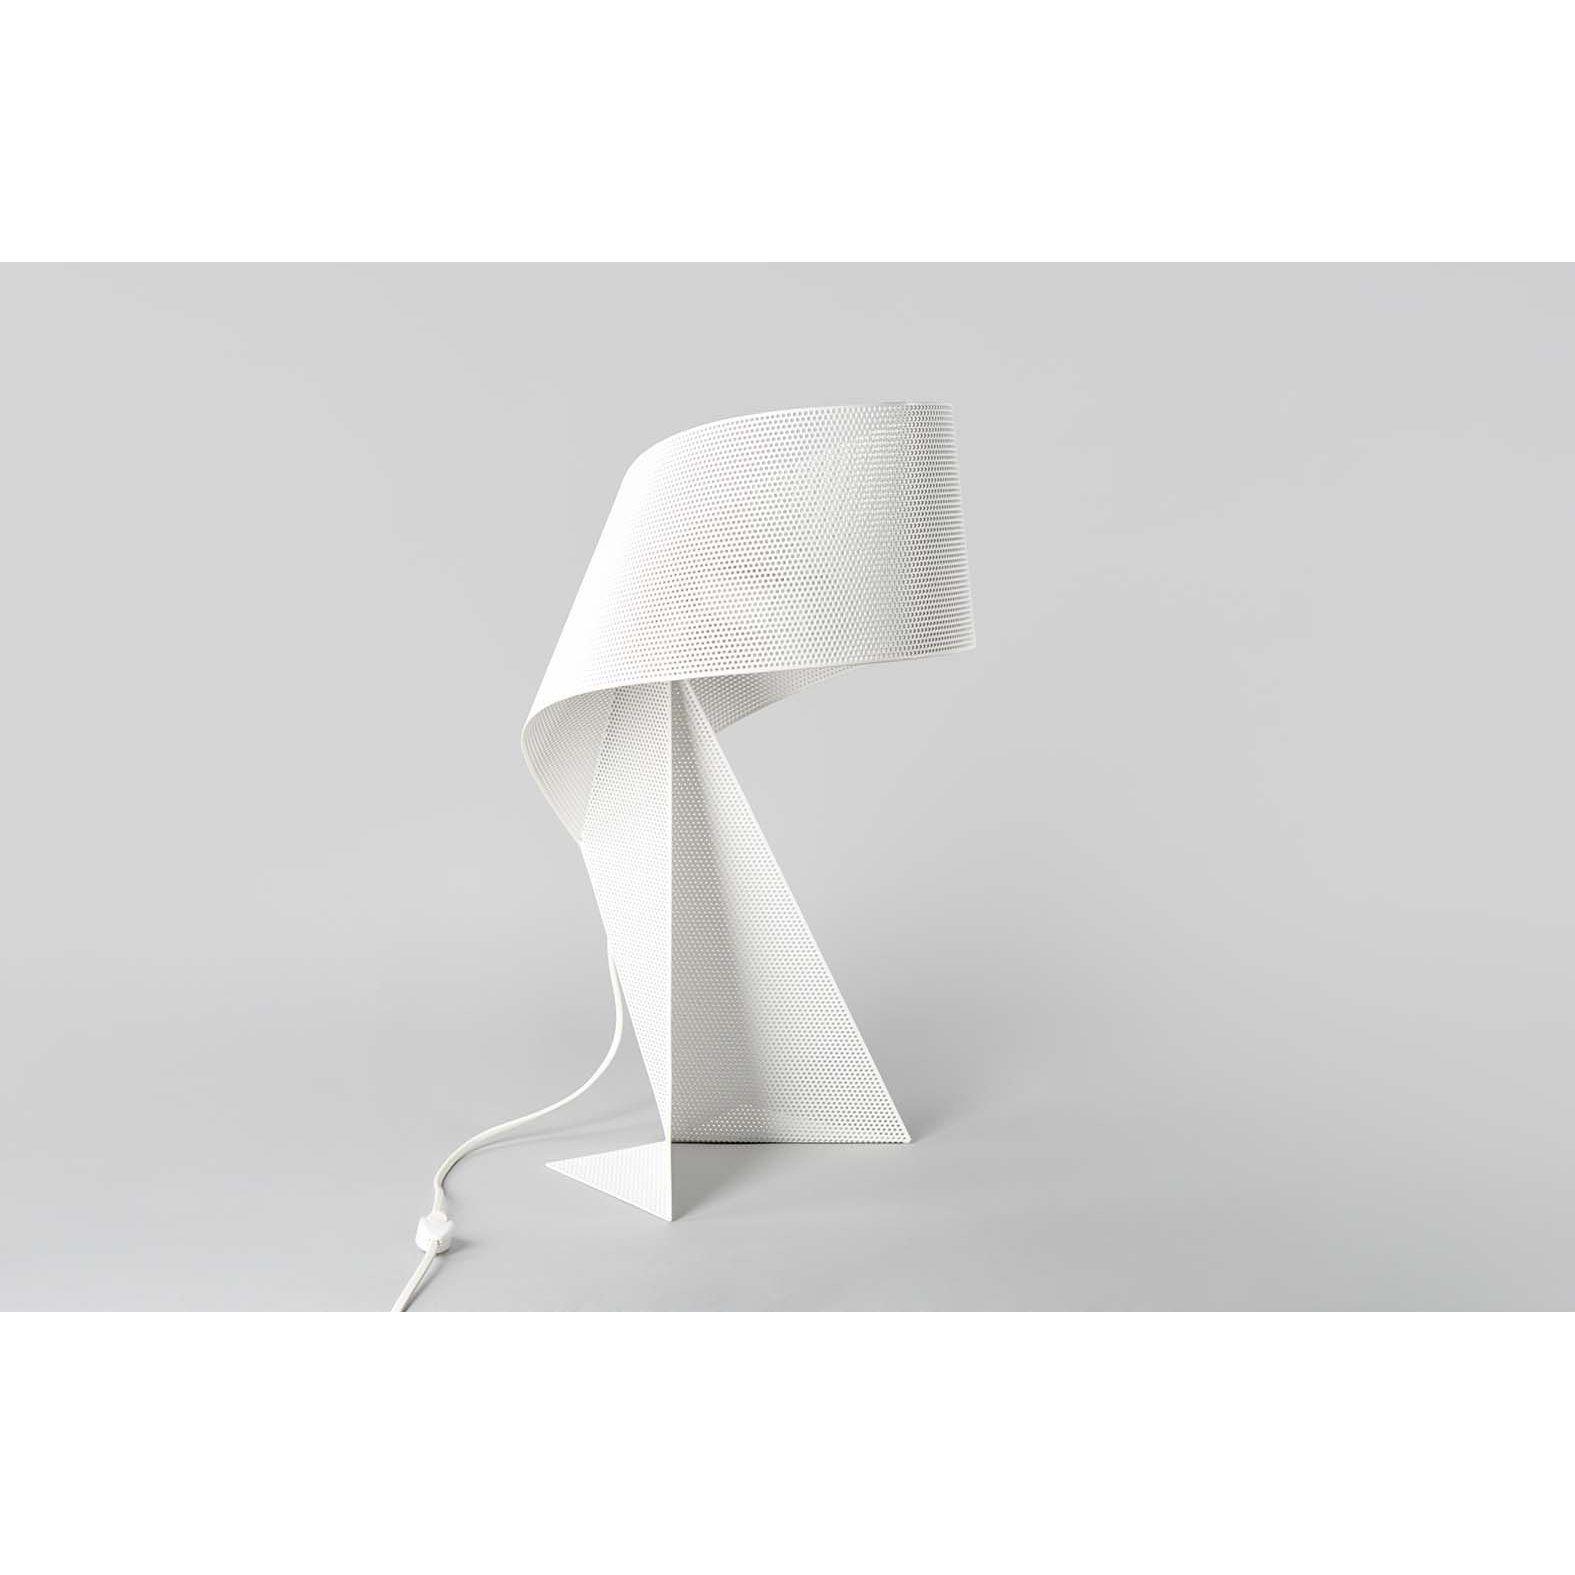 Lampe Perforee A Poser Ribbon Chez Habitat Lamp Home Decor